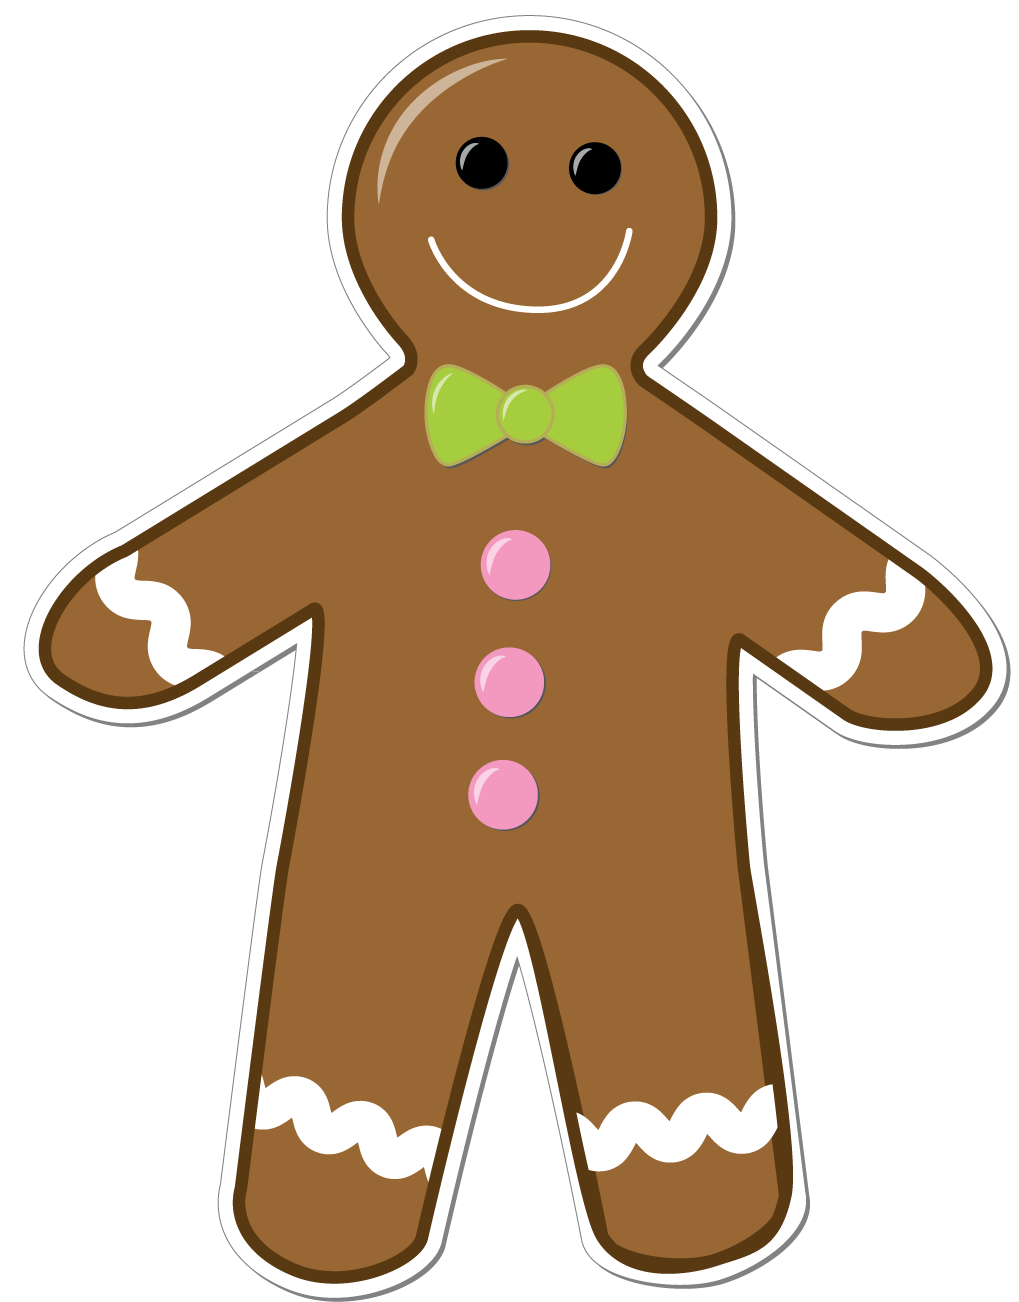 1019x1302 Gingerbread Man Clip Art Amp Gingerbread Man Clipart Images